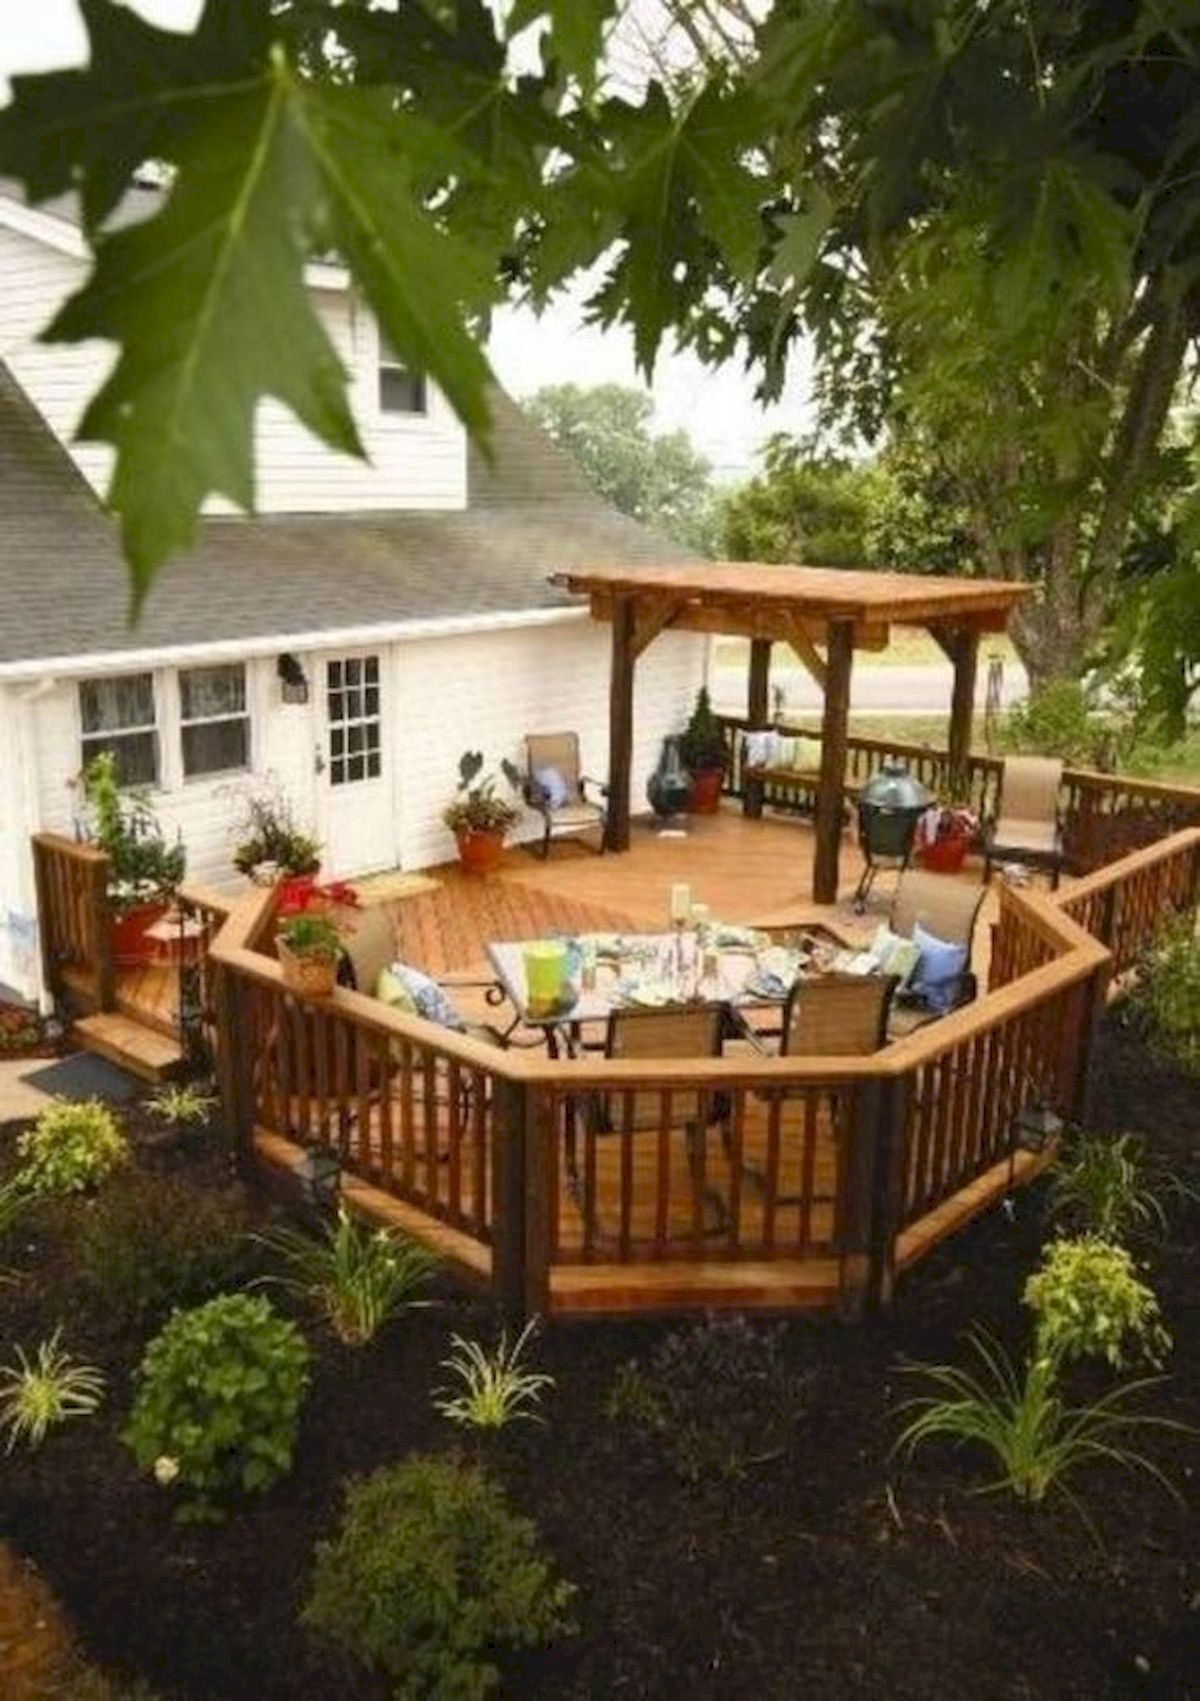 50 Fantastic Backyard Patio and Decking Design Ideas (24)